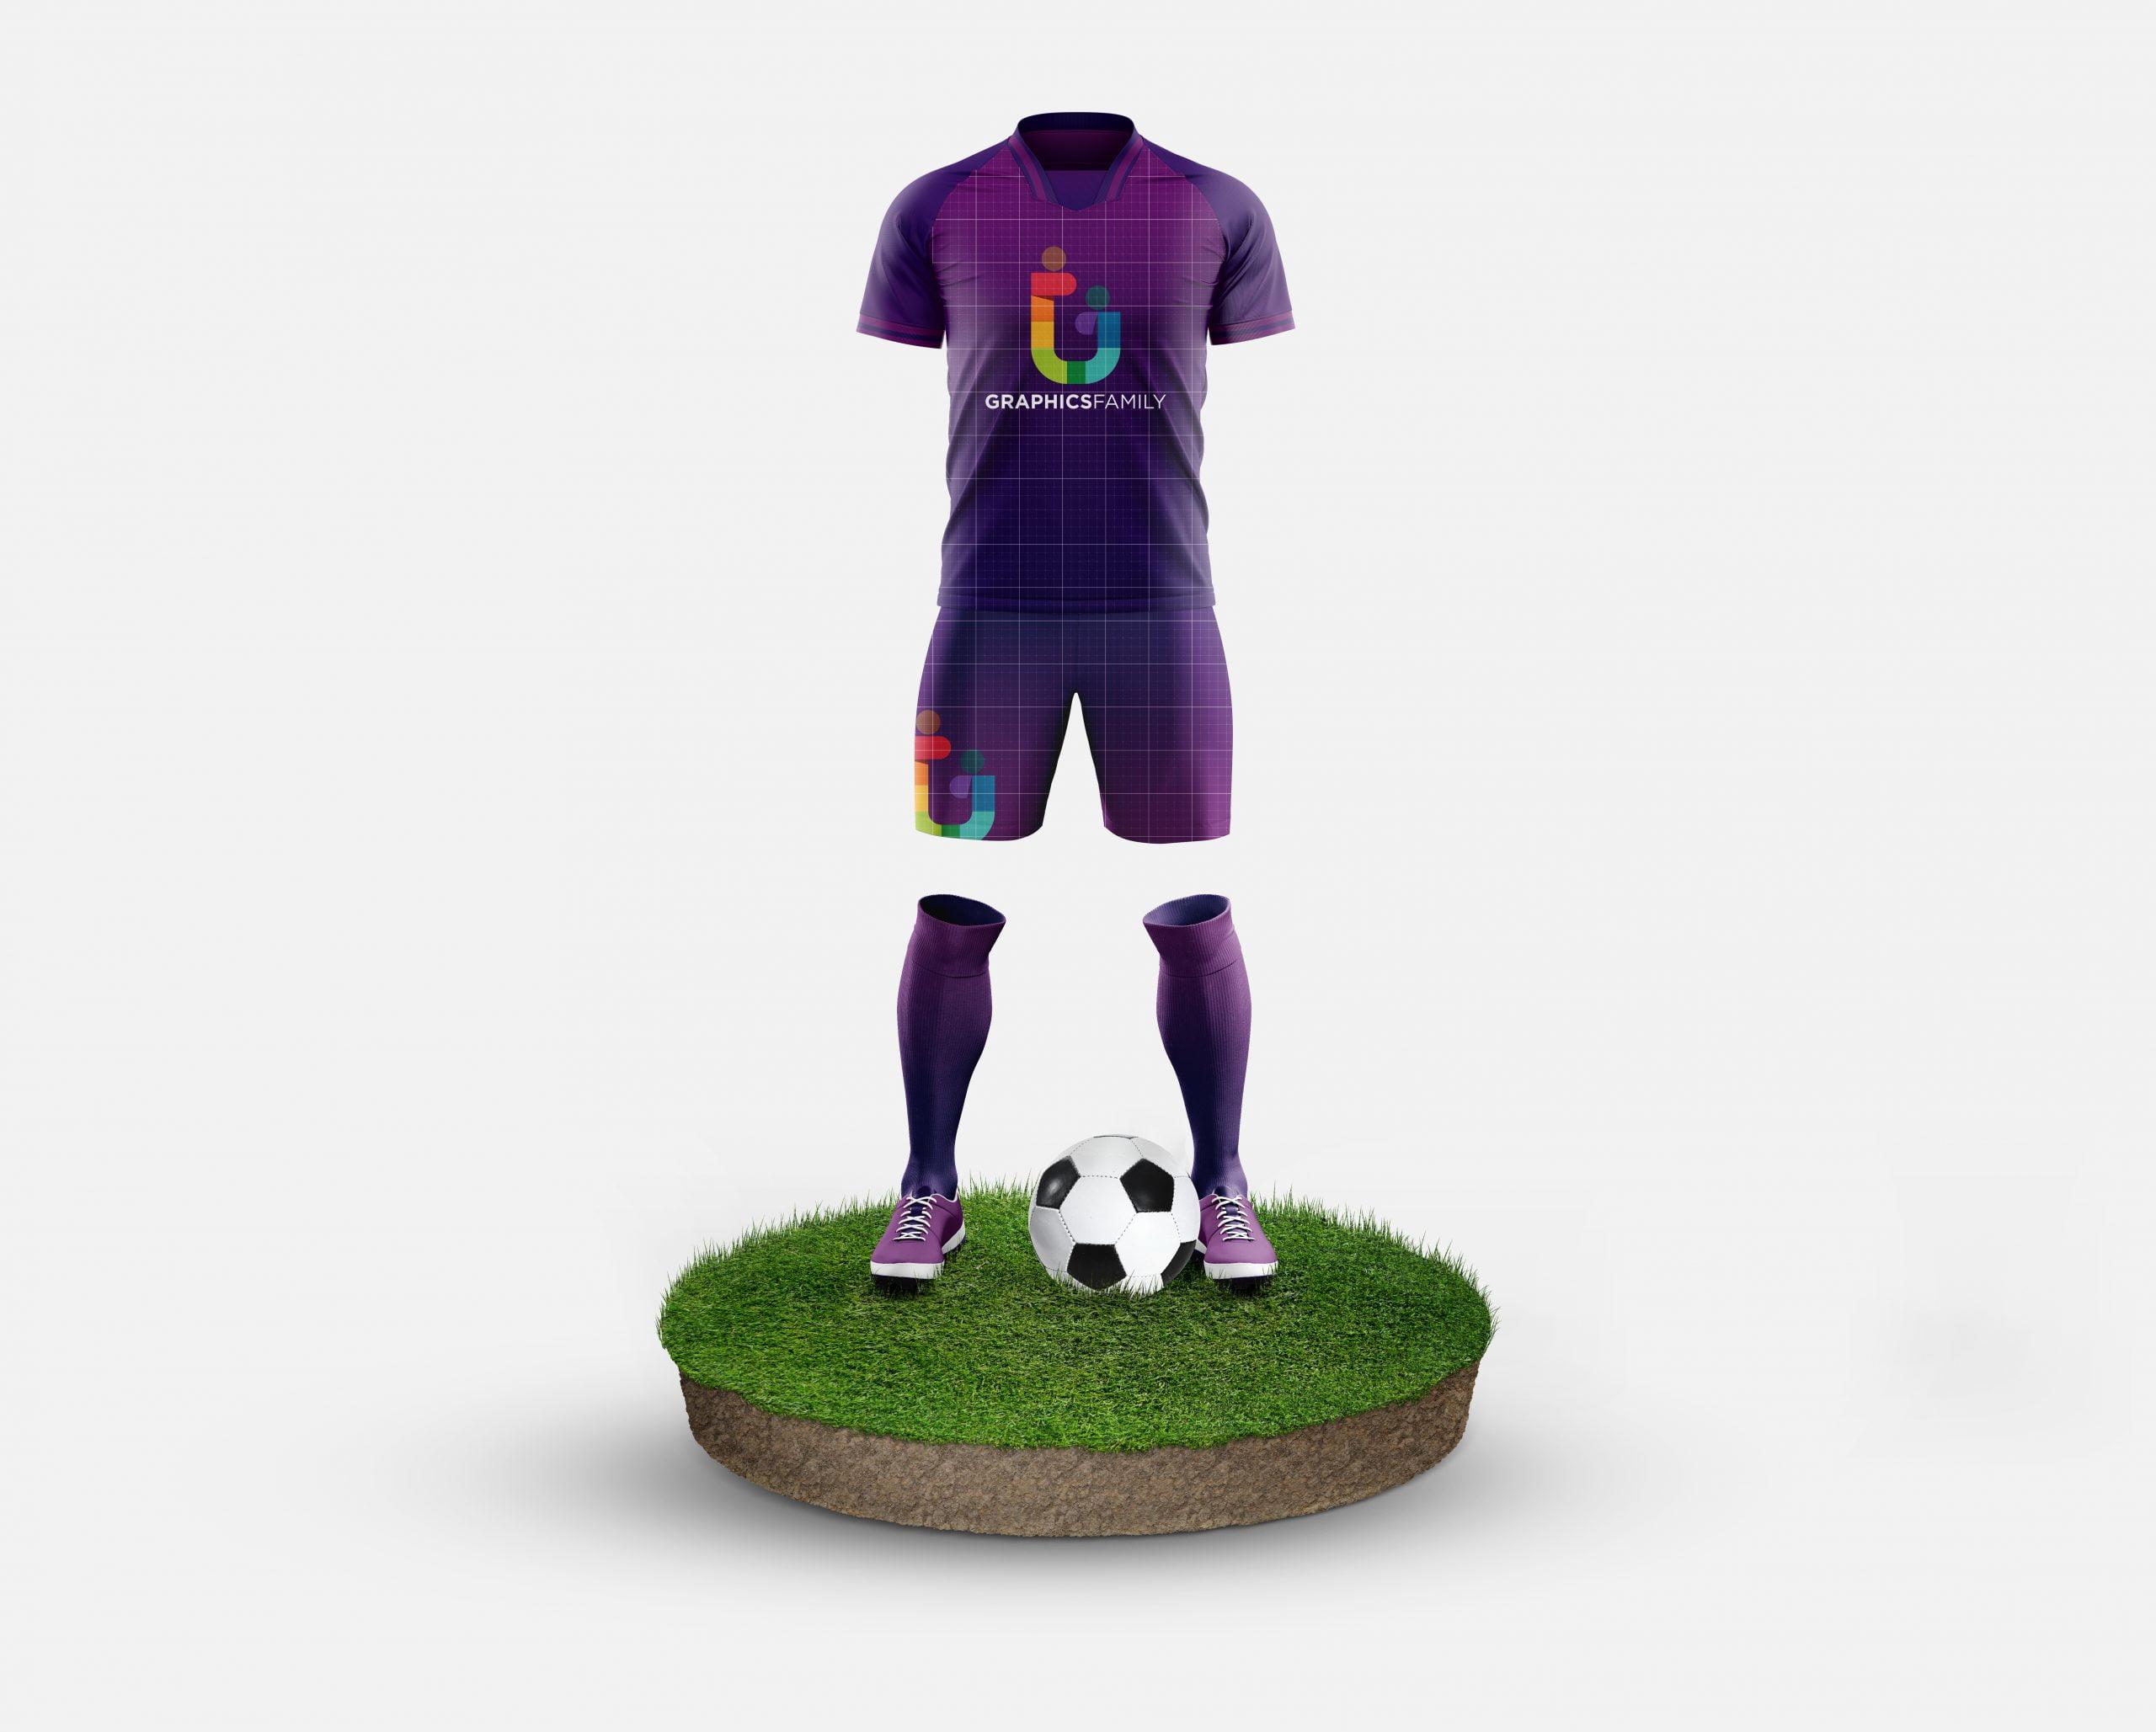 GraphicsFamily Free Football Kit Mockup Template